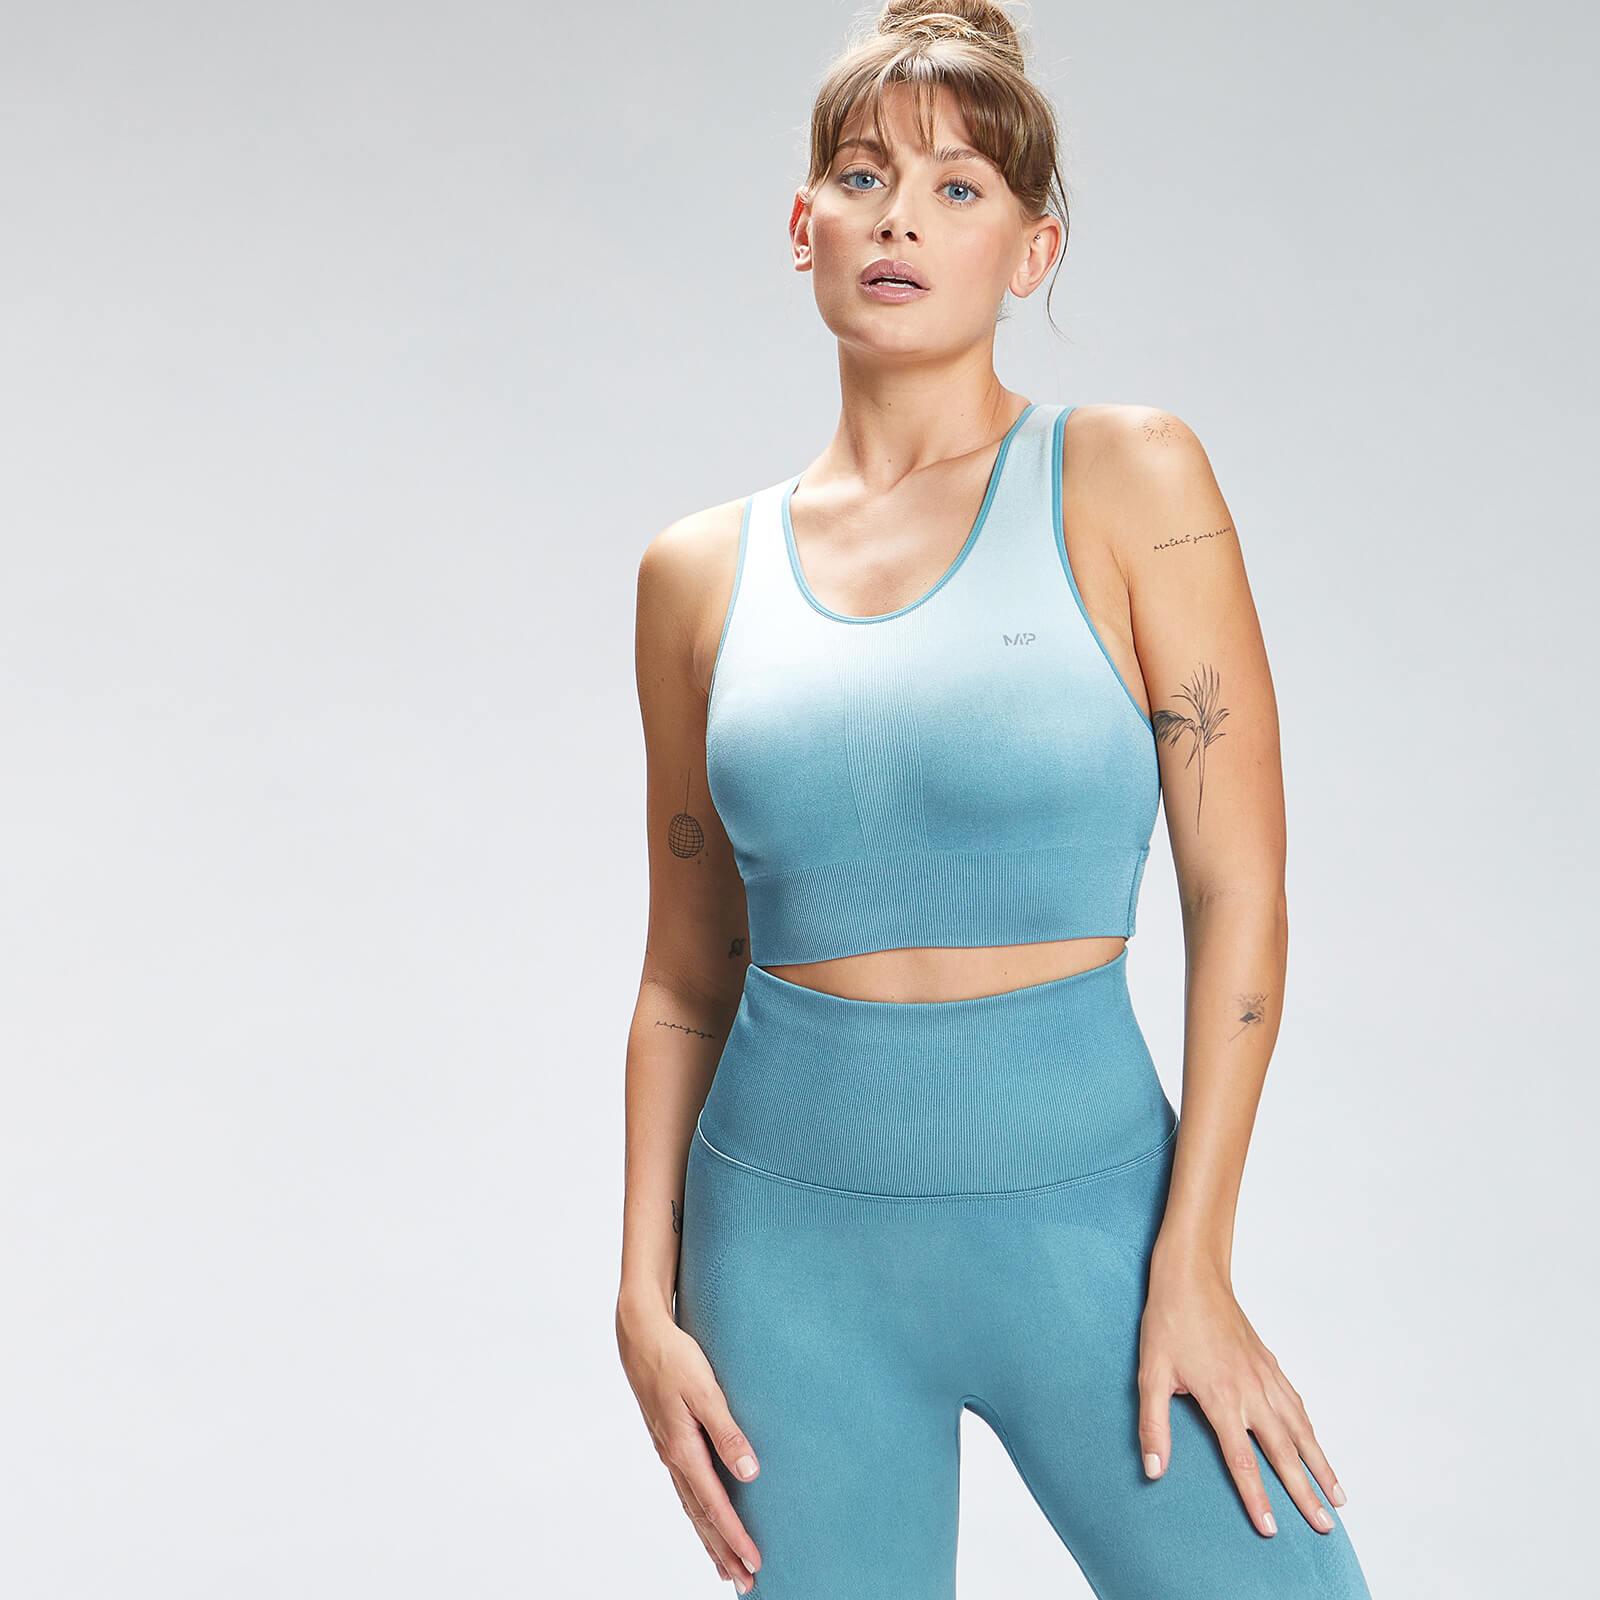 Купить MP Women's Velocity Seamless Sports Bra - Ocean Blue - XXS, Myprotein International